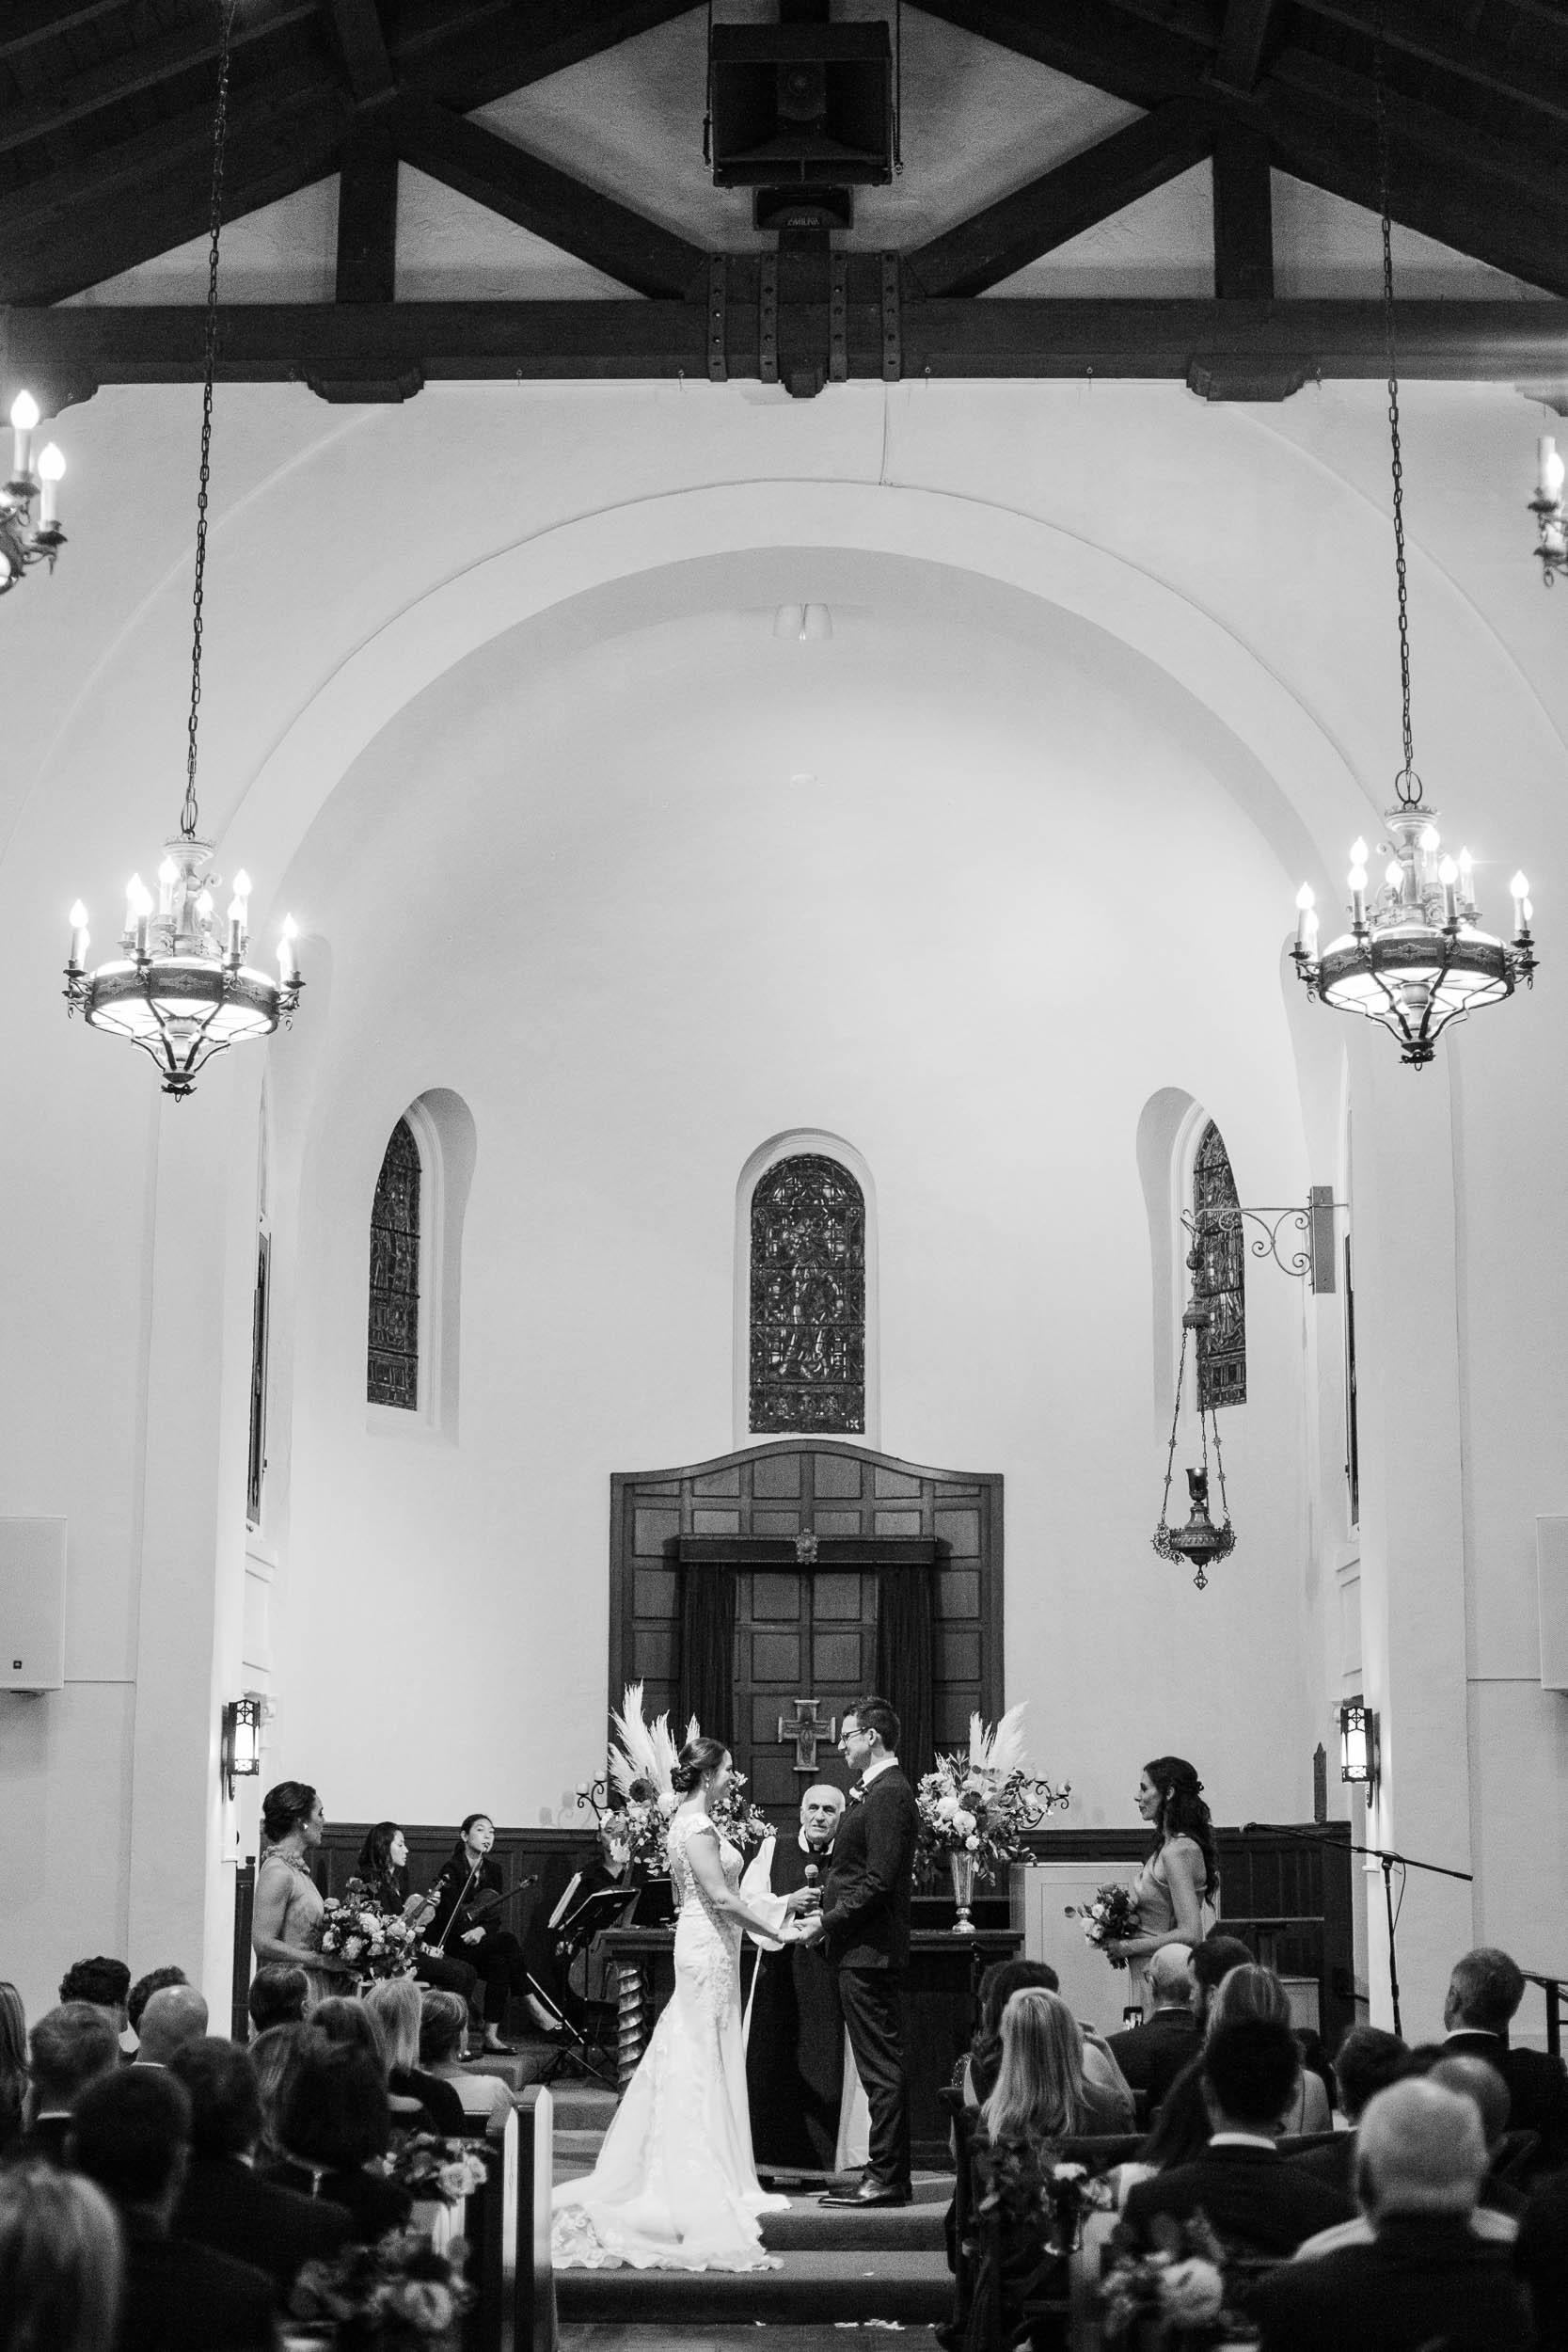 102117_C+D_Golden Gate Club Wedding_Buena Lane Photography_0752ER-2.jpg